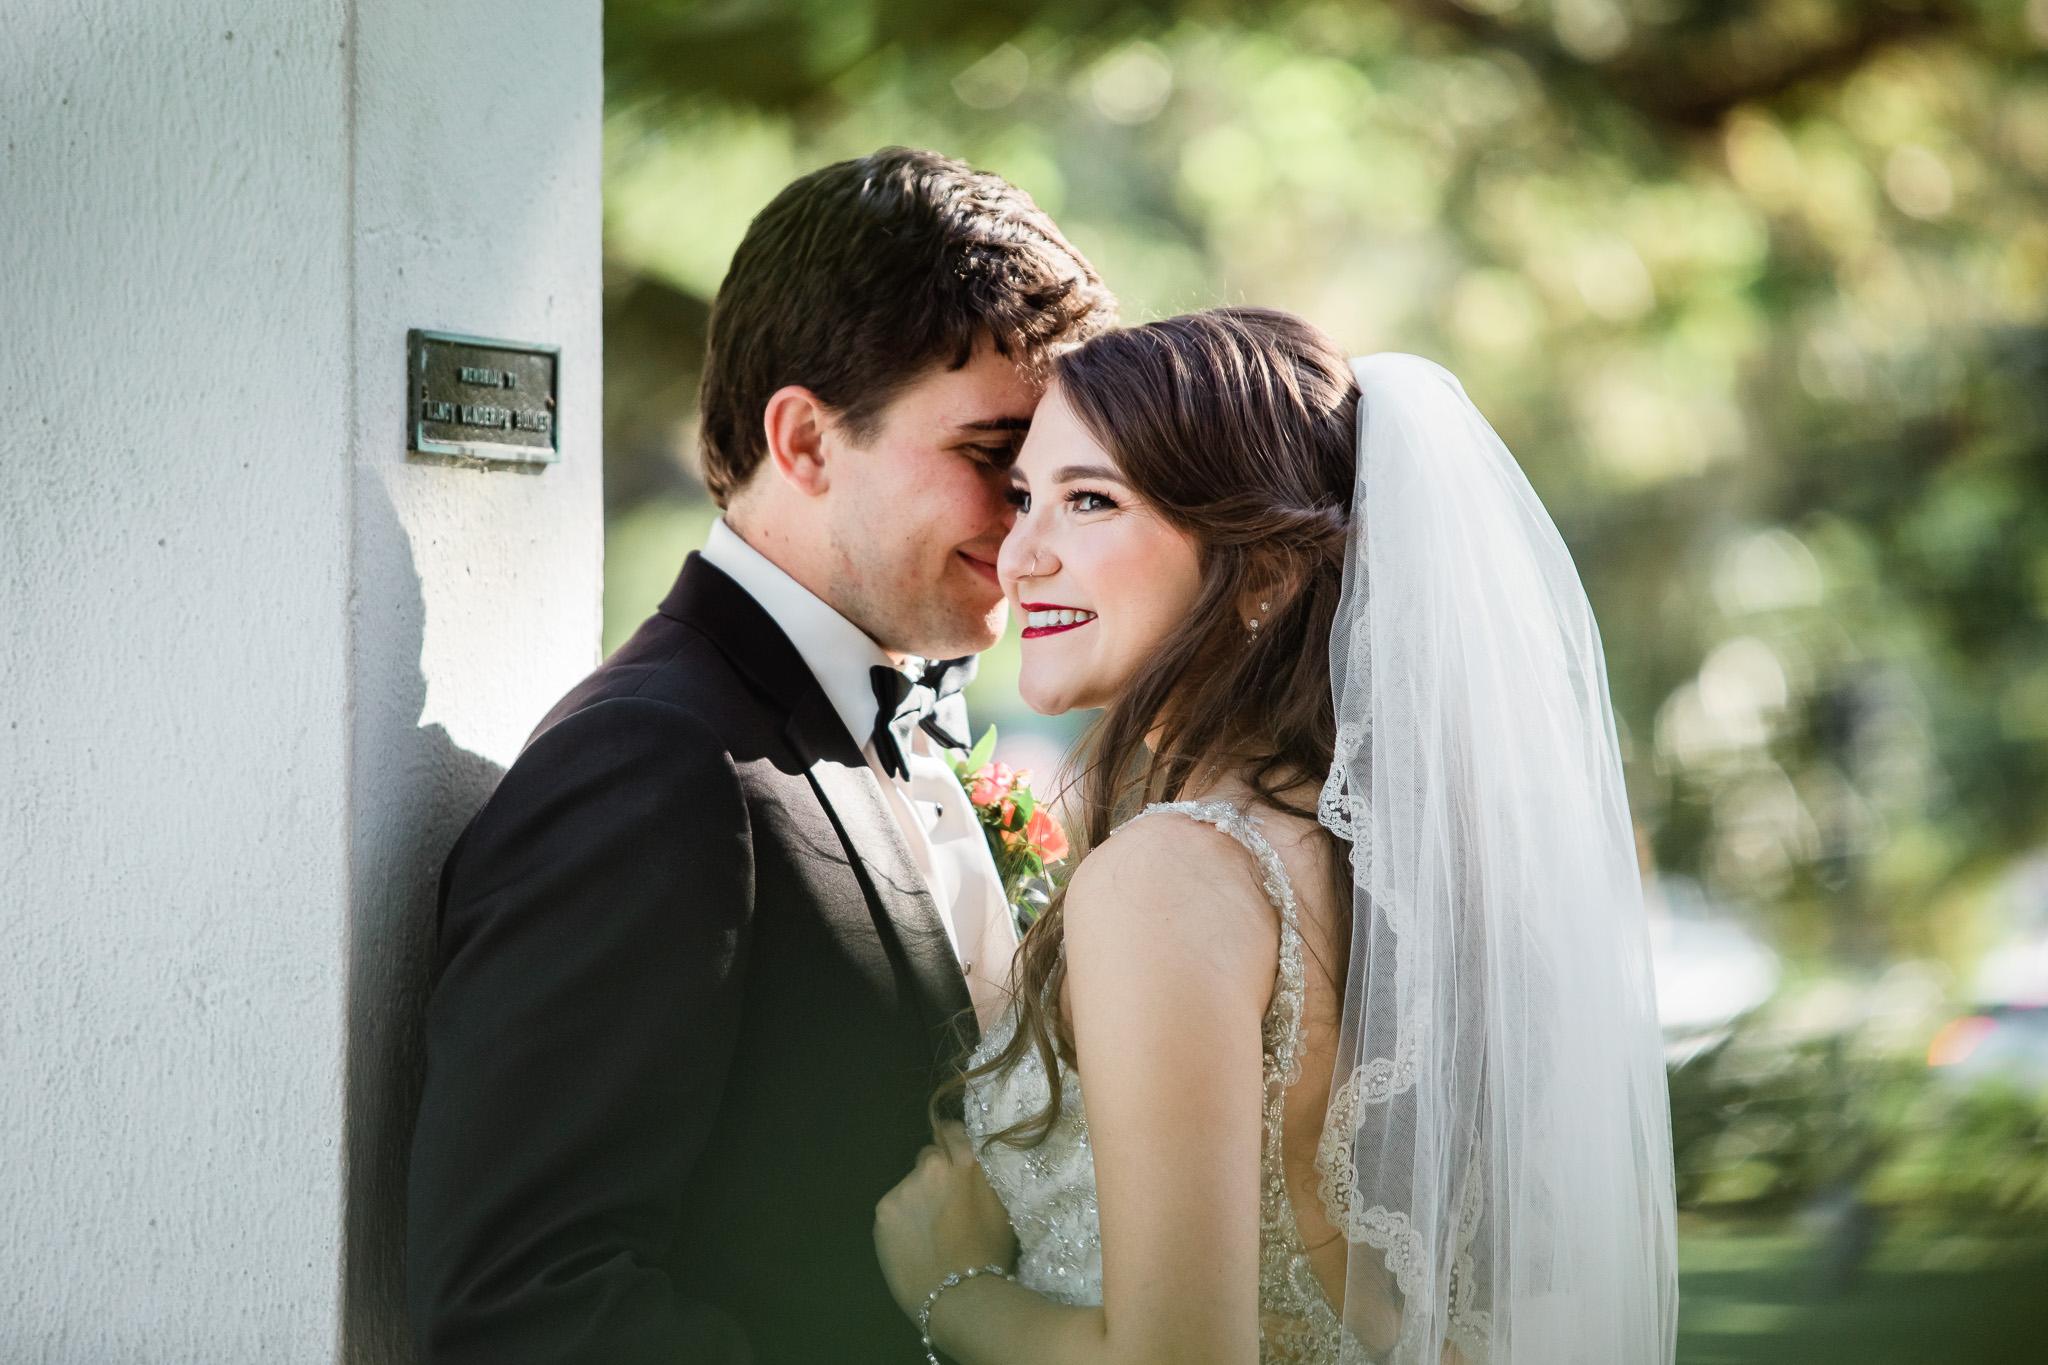 TAMPA_WEDDING_PHOTOGRAPHER_MPMZ_TJL47258_0065.jpg